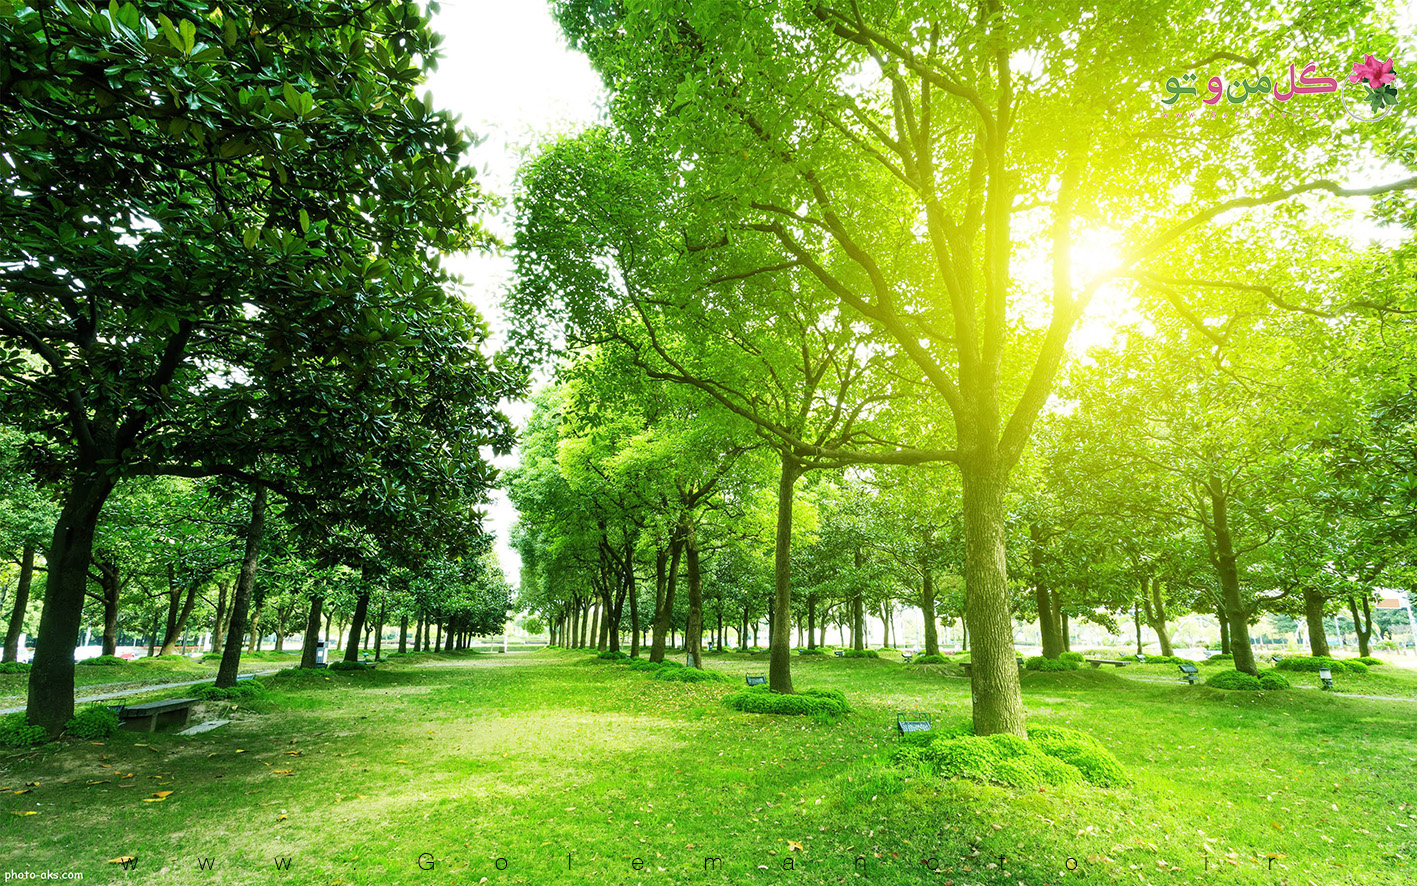 green tree sun shine سبزسازی زمین؛ راهی مؤثر برای کاهش سطوح کربن